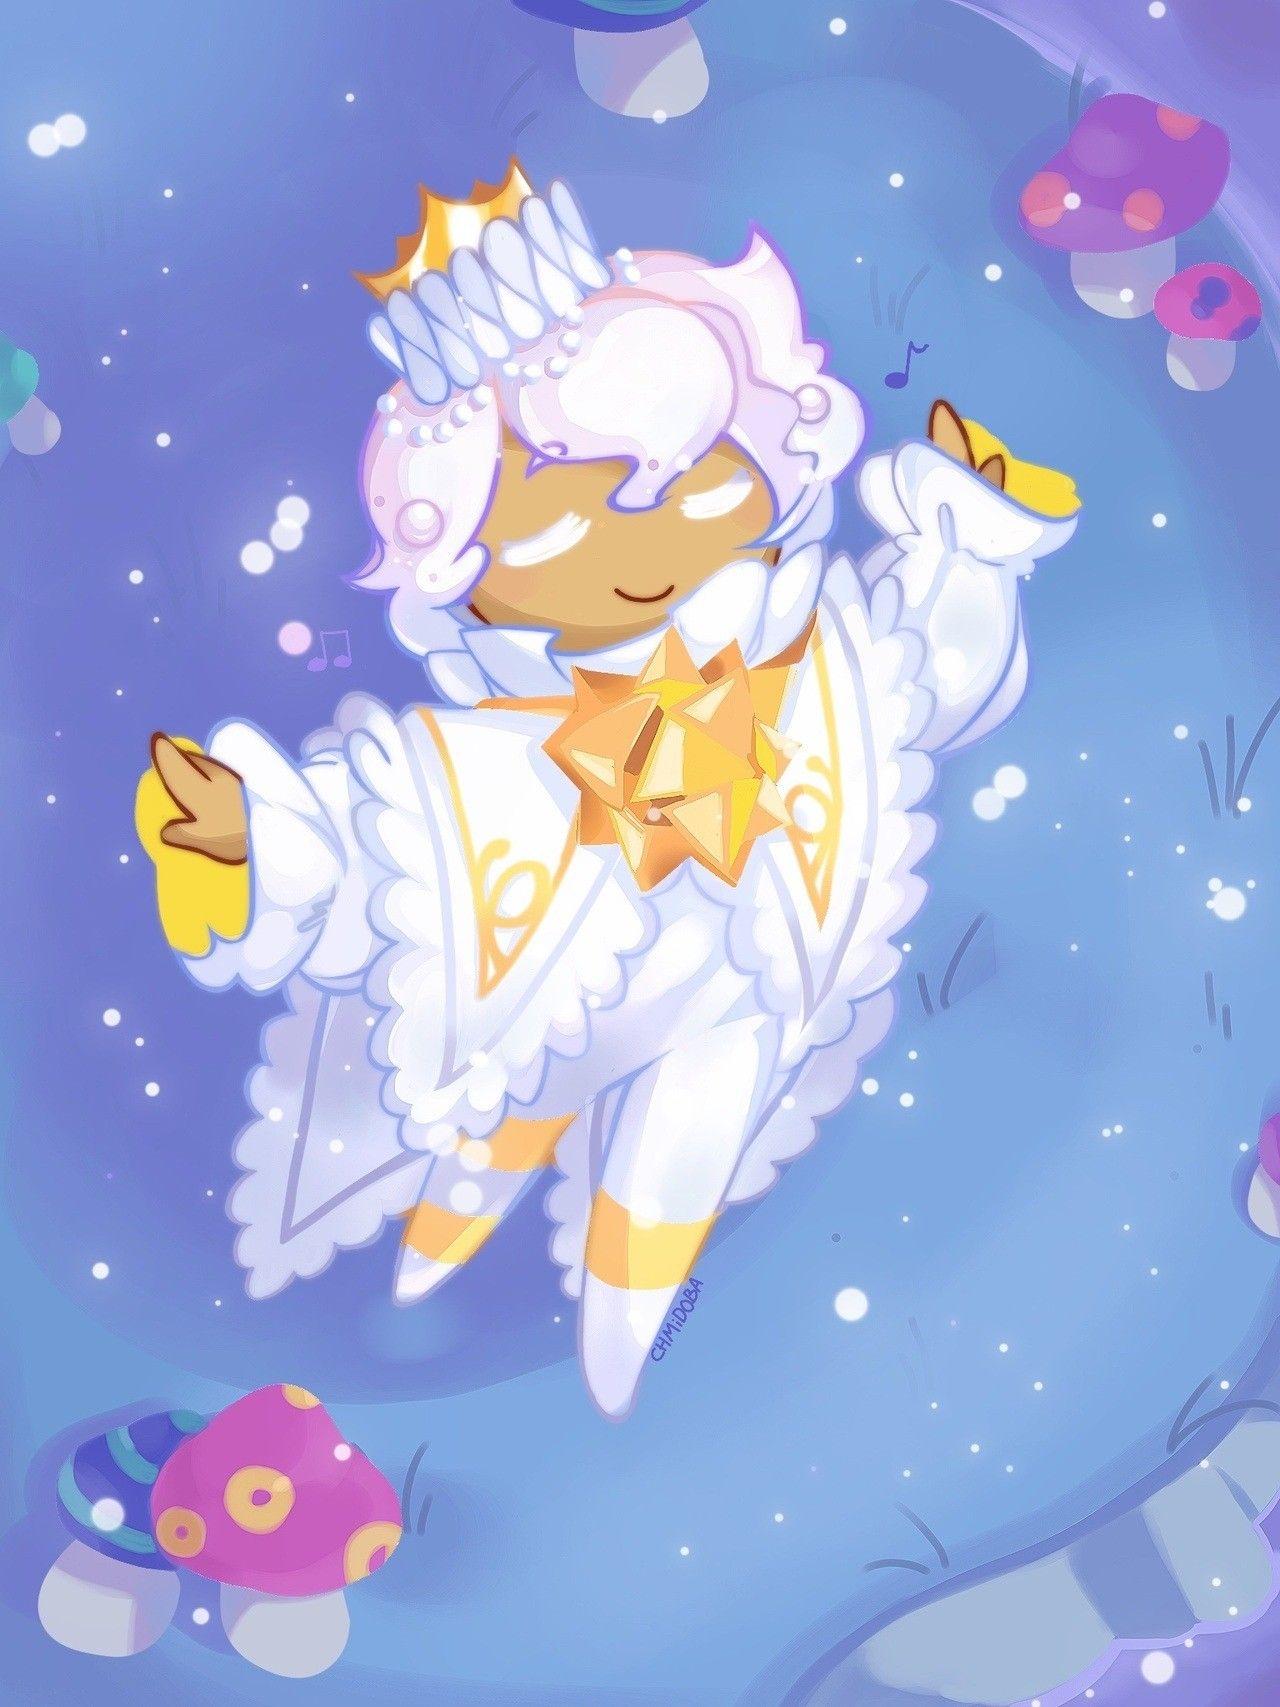 Pin by ! n0 ╶ ₦₳m& ⋈ on Печеньки/cookie run | Cookie run, Character  creation, Anime